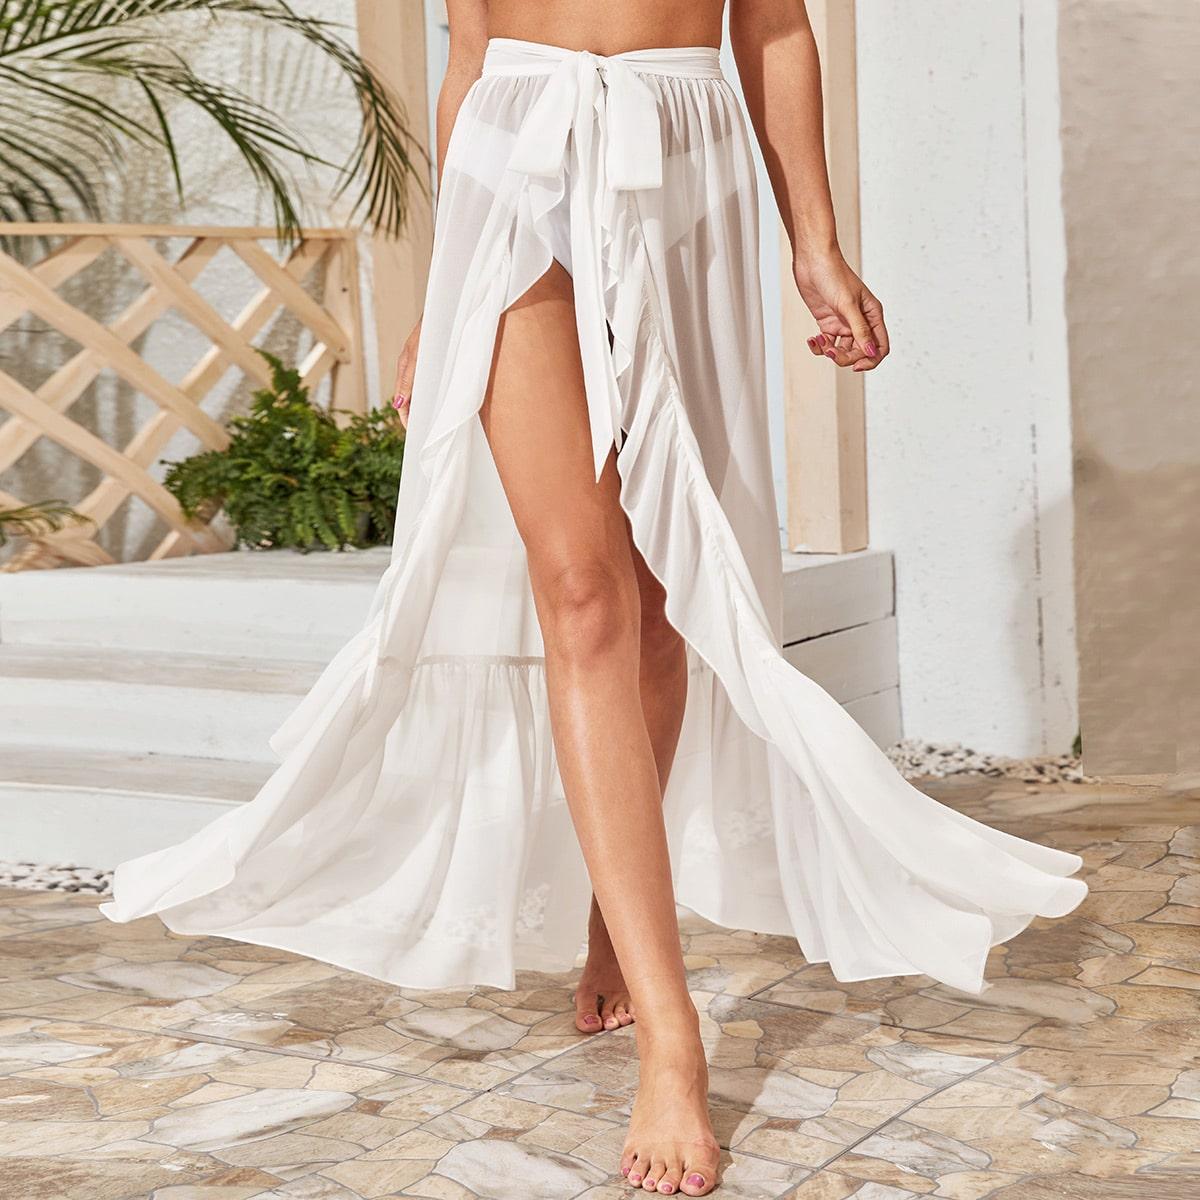 Прозрачная накидка-юбка на запах без бикини фото